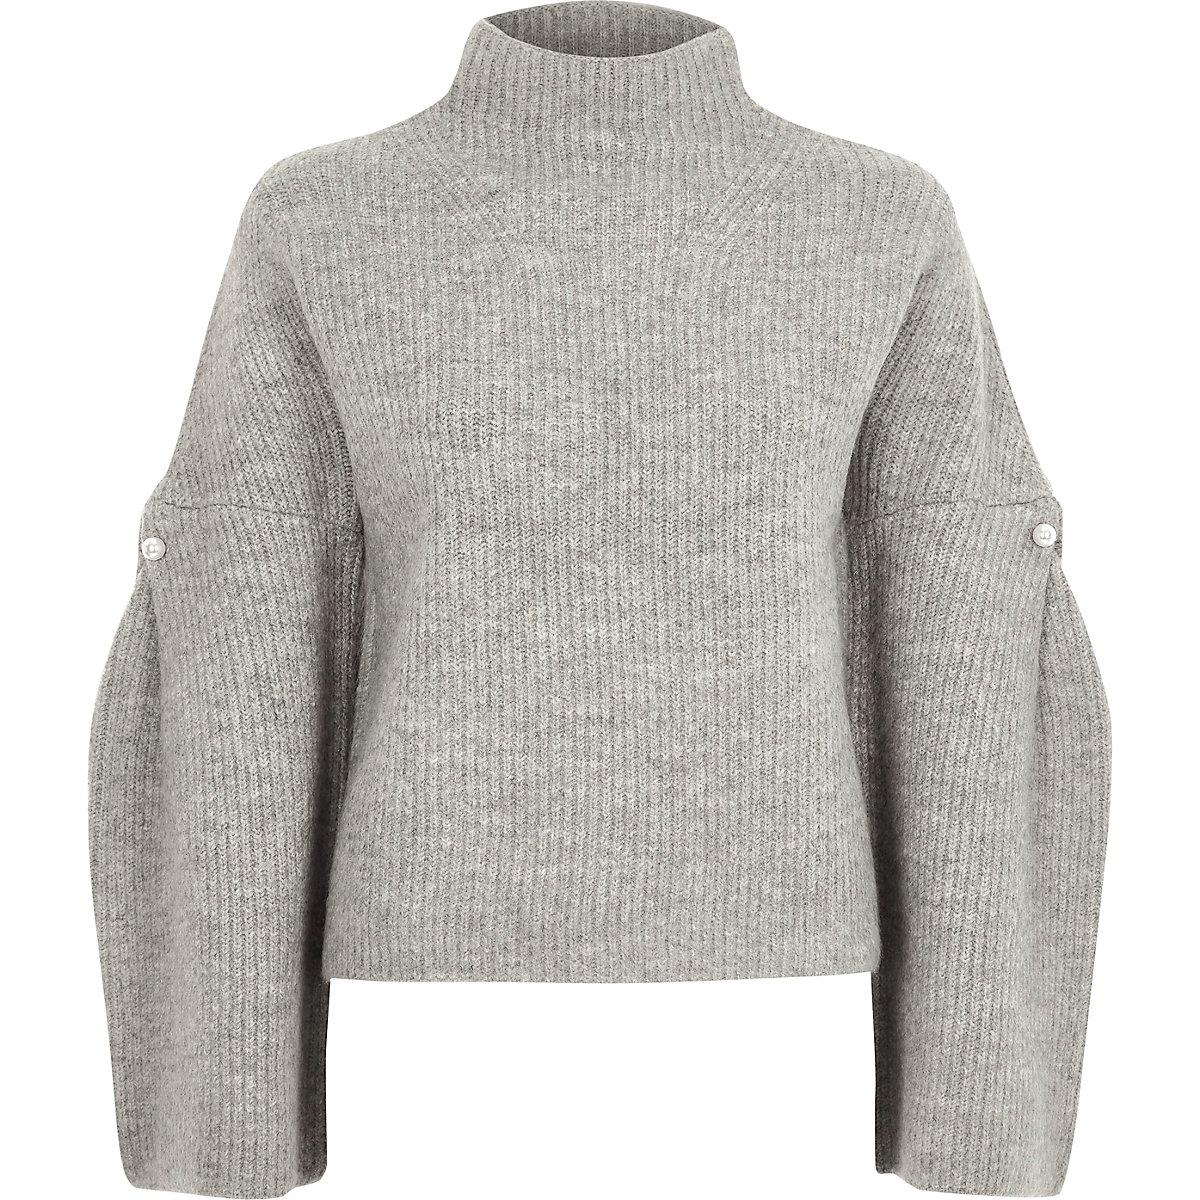 Grey high neck wide sleeve knit jumper